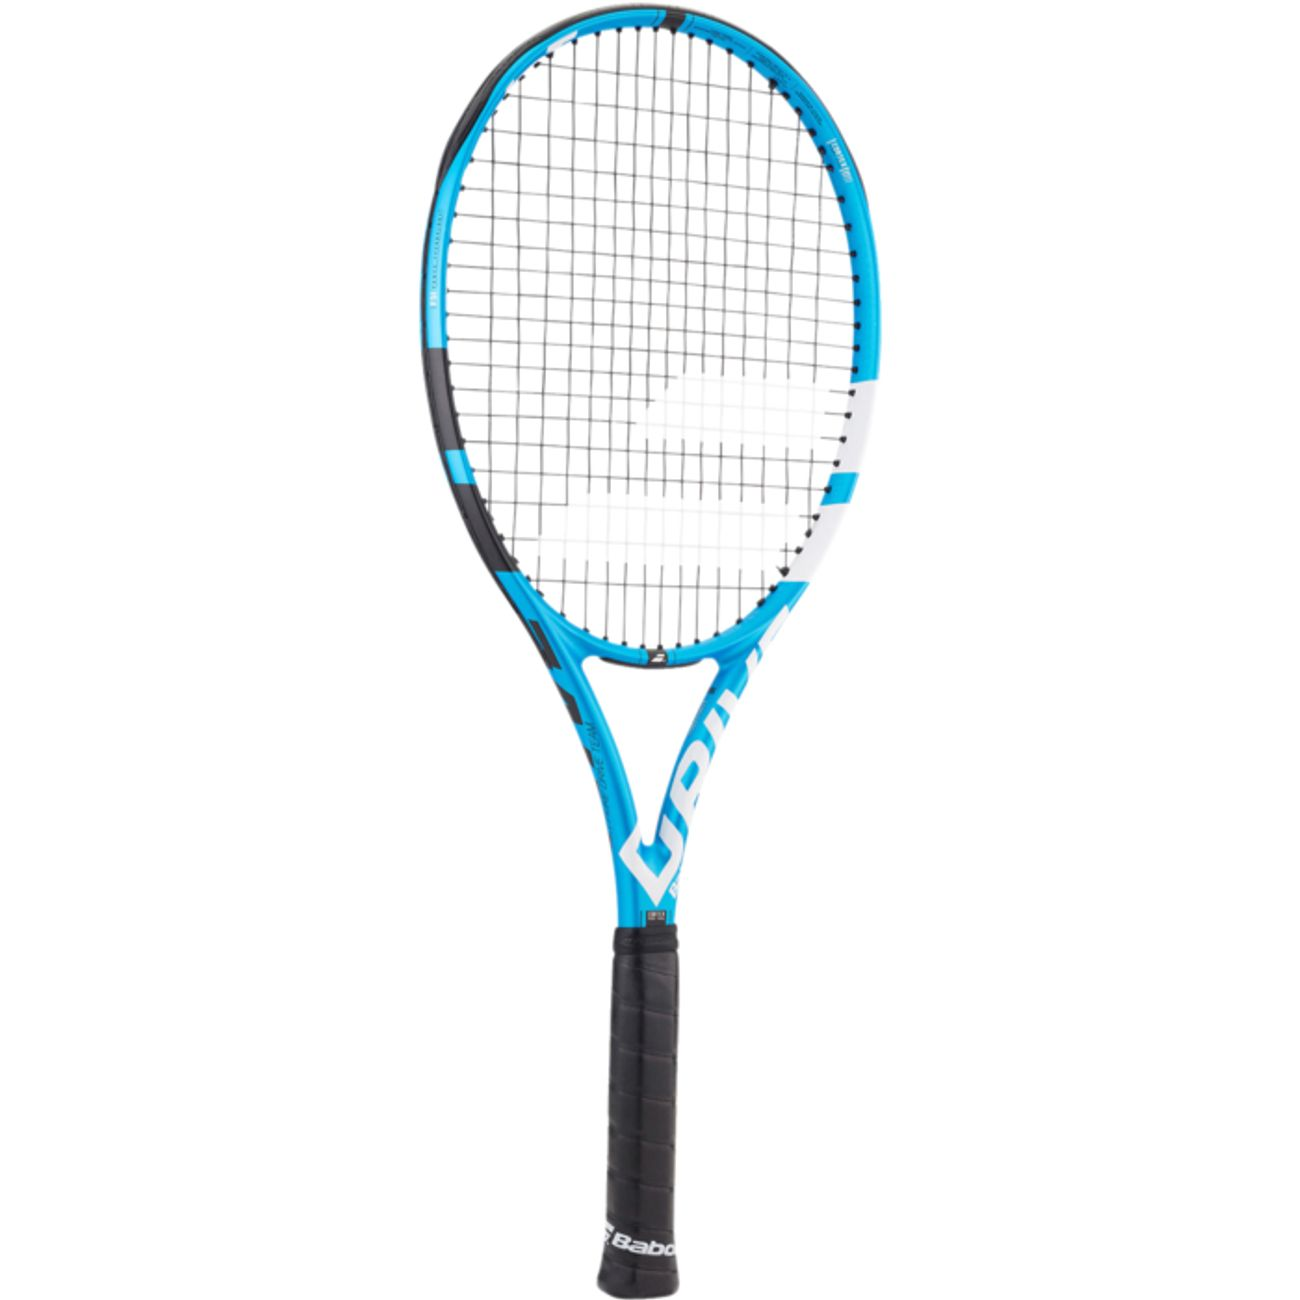 RAQUETTE Tennis adulte BABOLAT PURE DRIVE TEAM